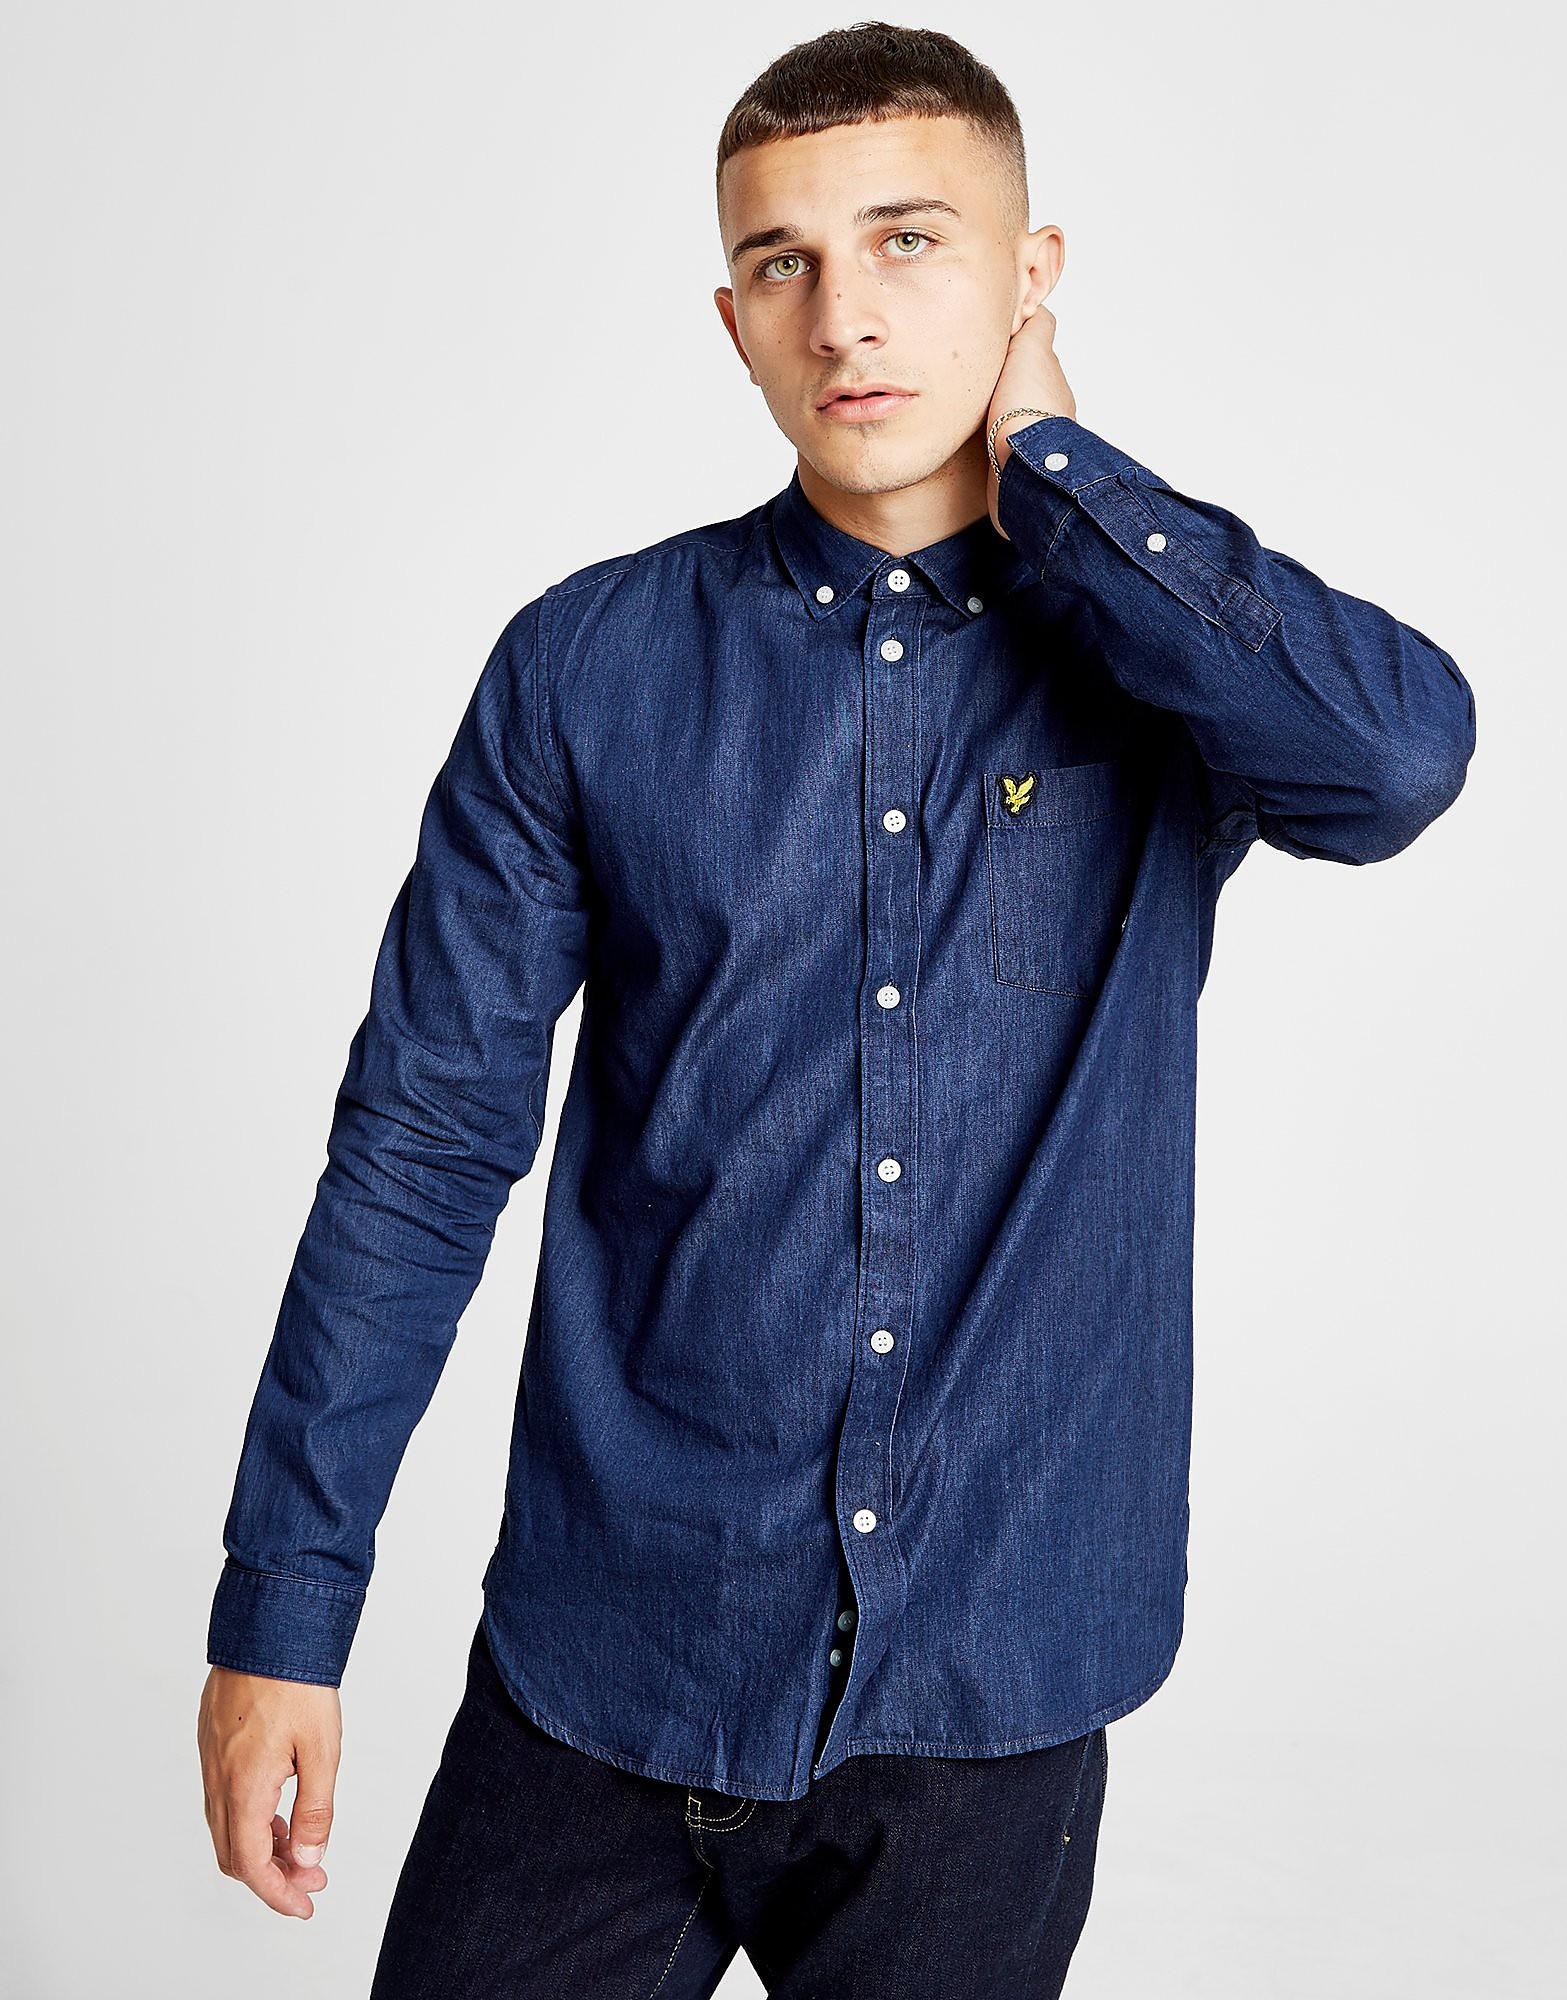 Lyle & Scott Long Sleeve Chamber Shirt Heren - Blauw - Heren